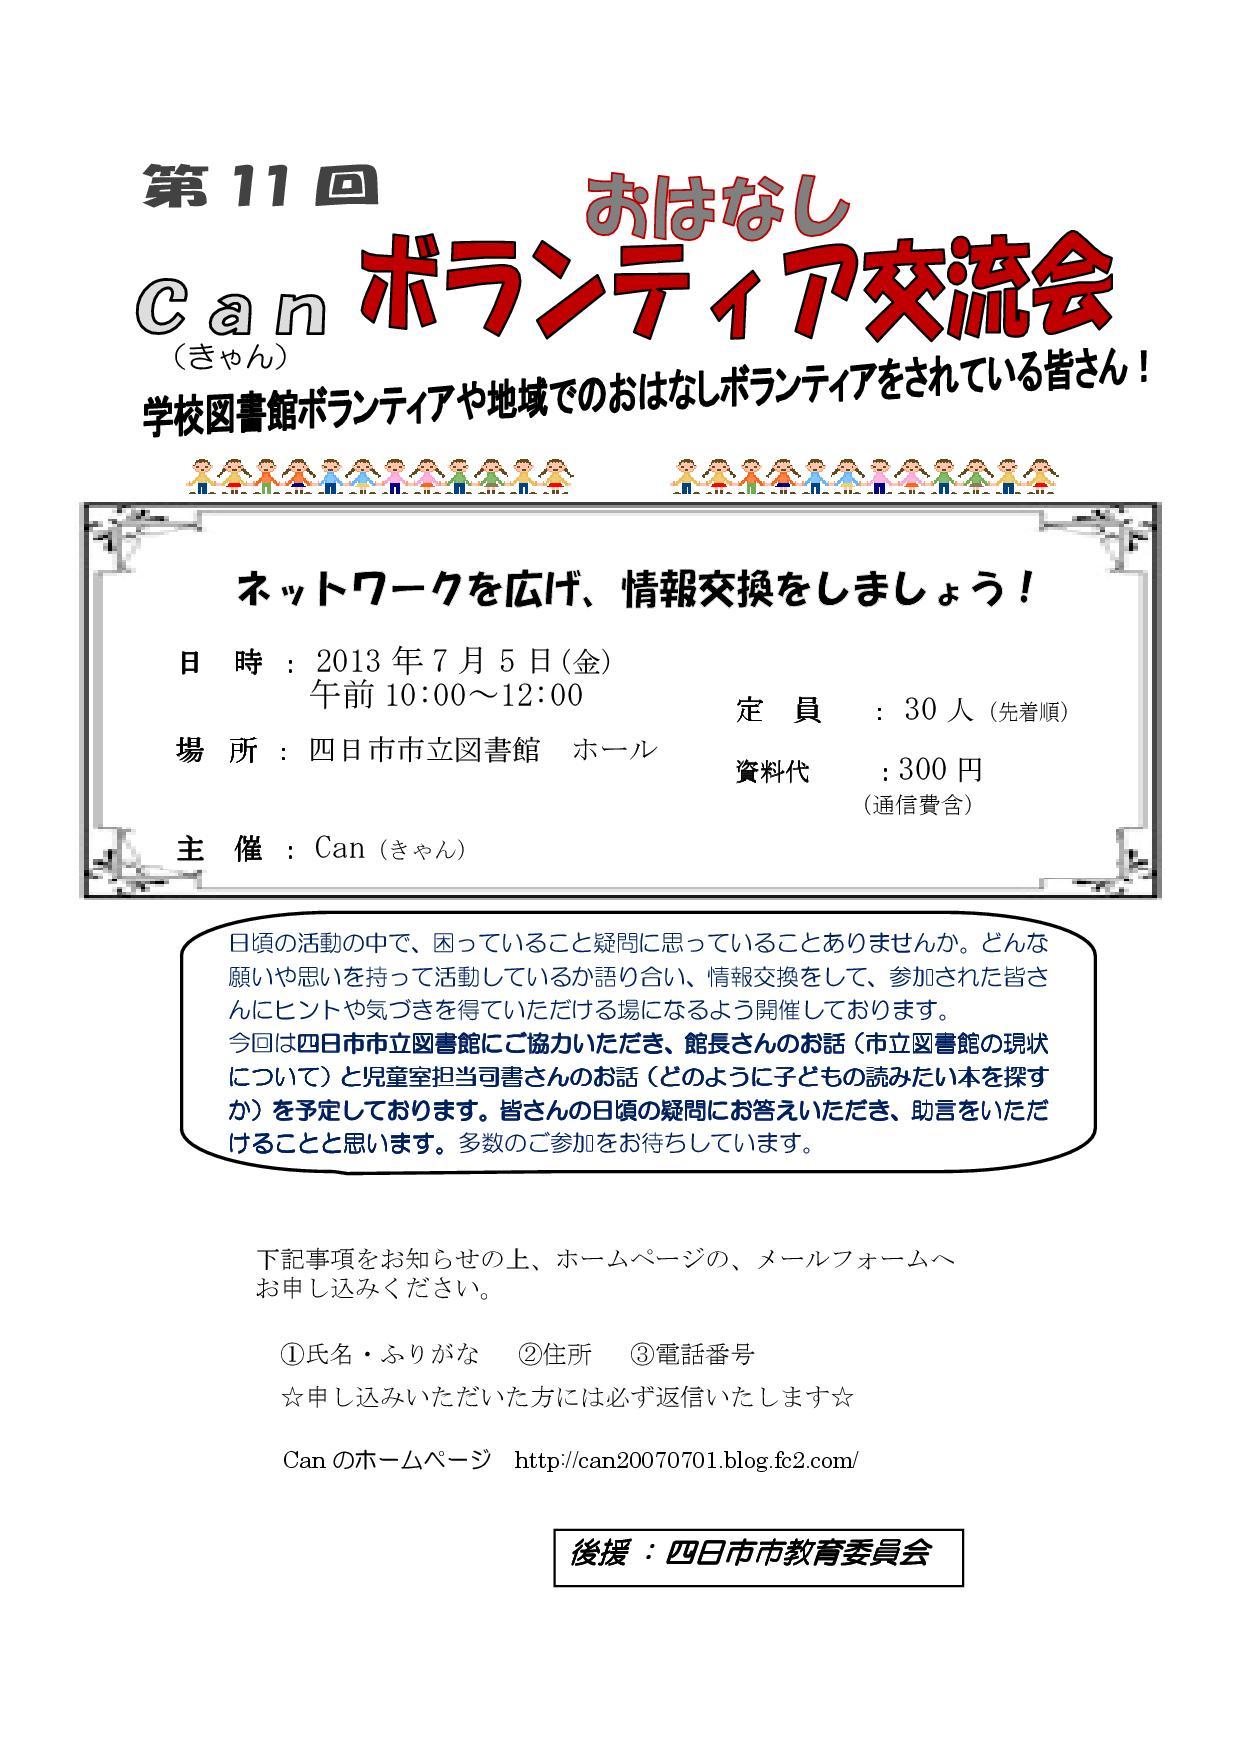 Microsoft Word - ●第11回 ボランティア交流会チラシホームページ用